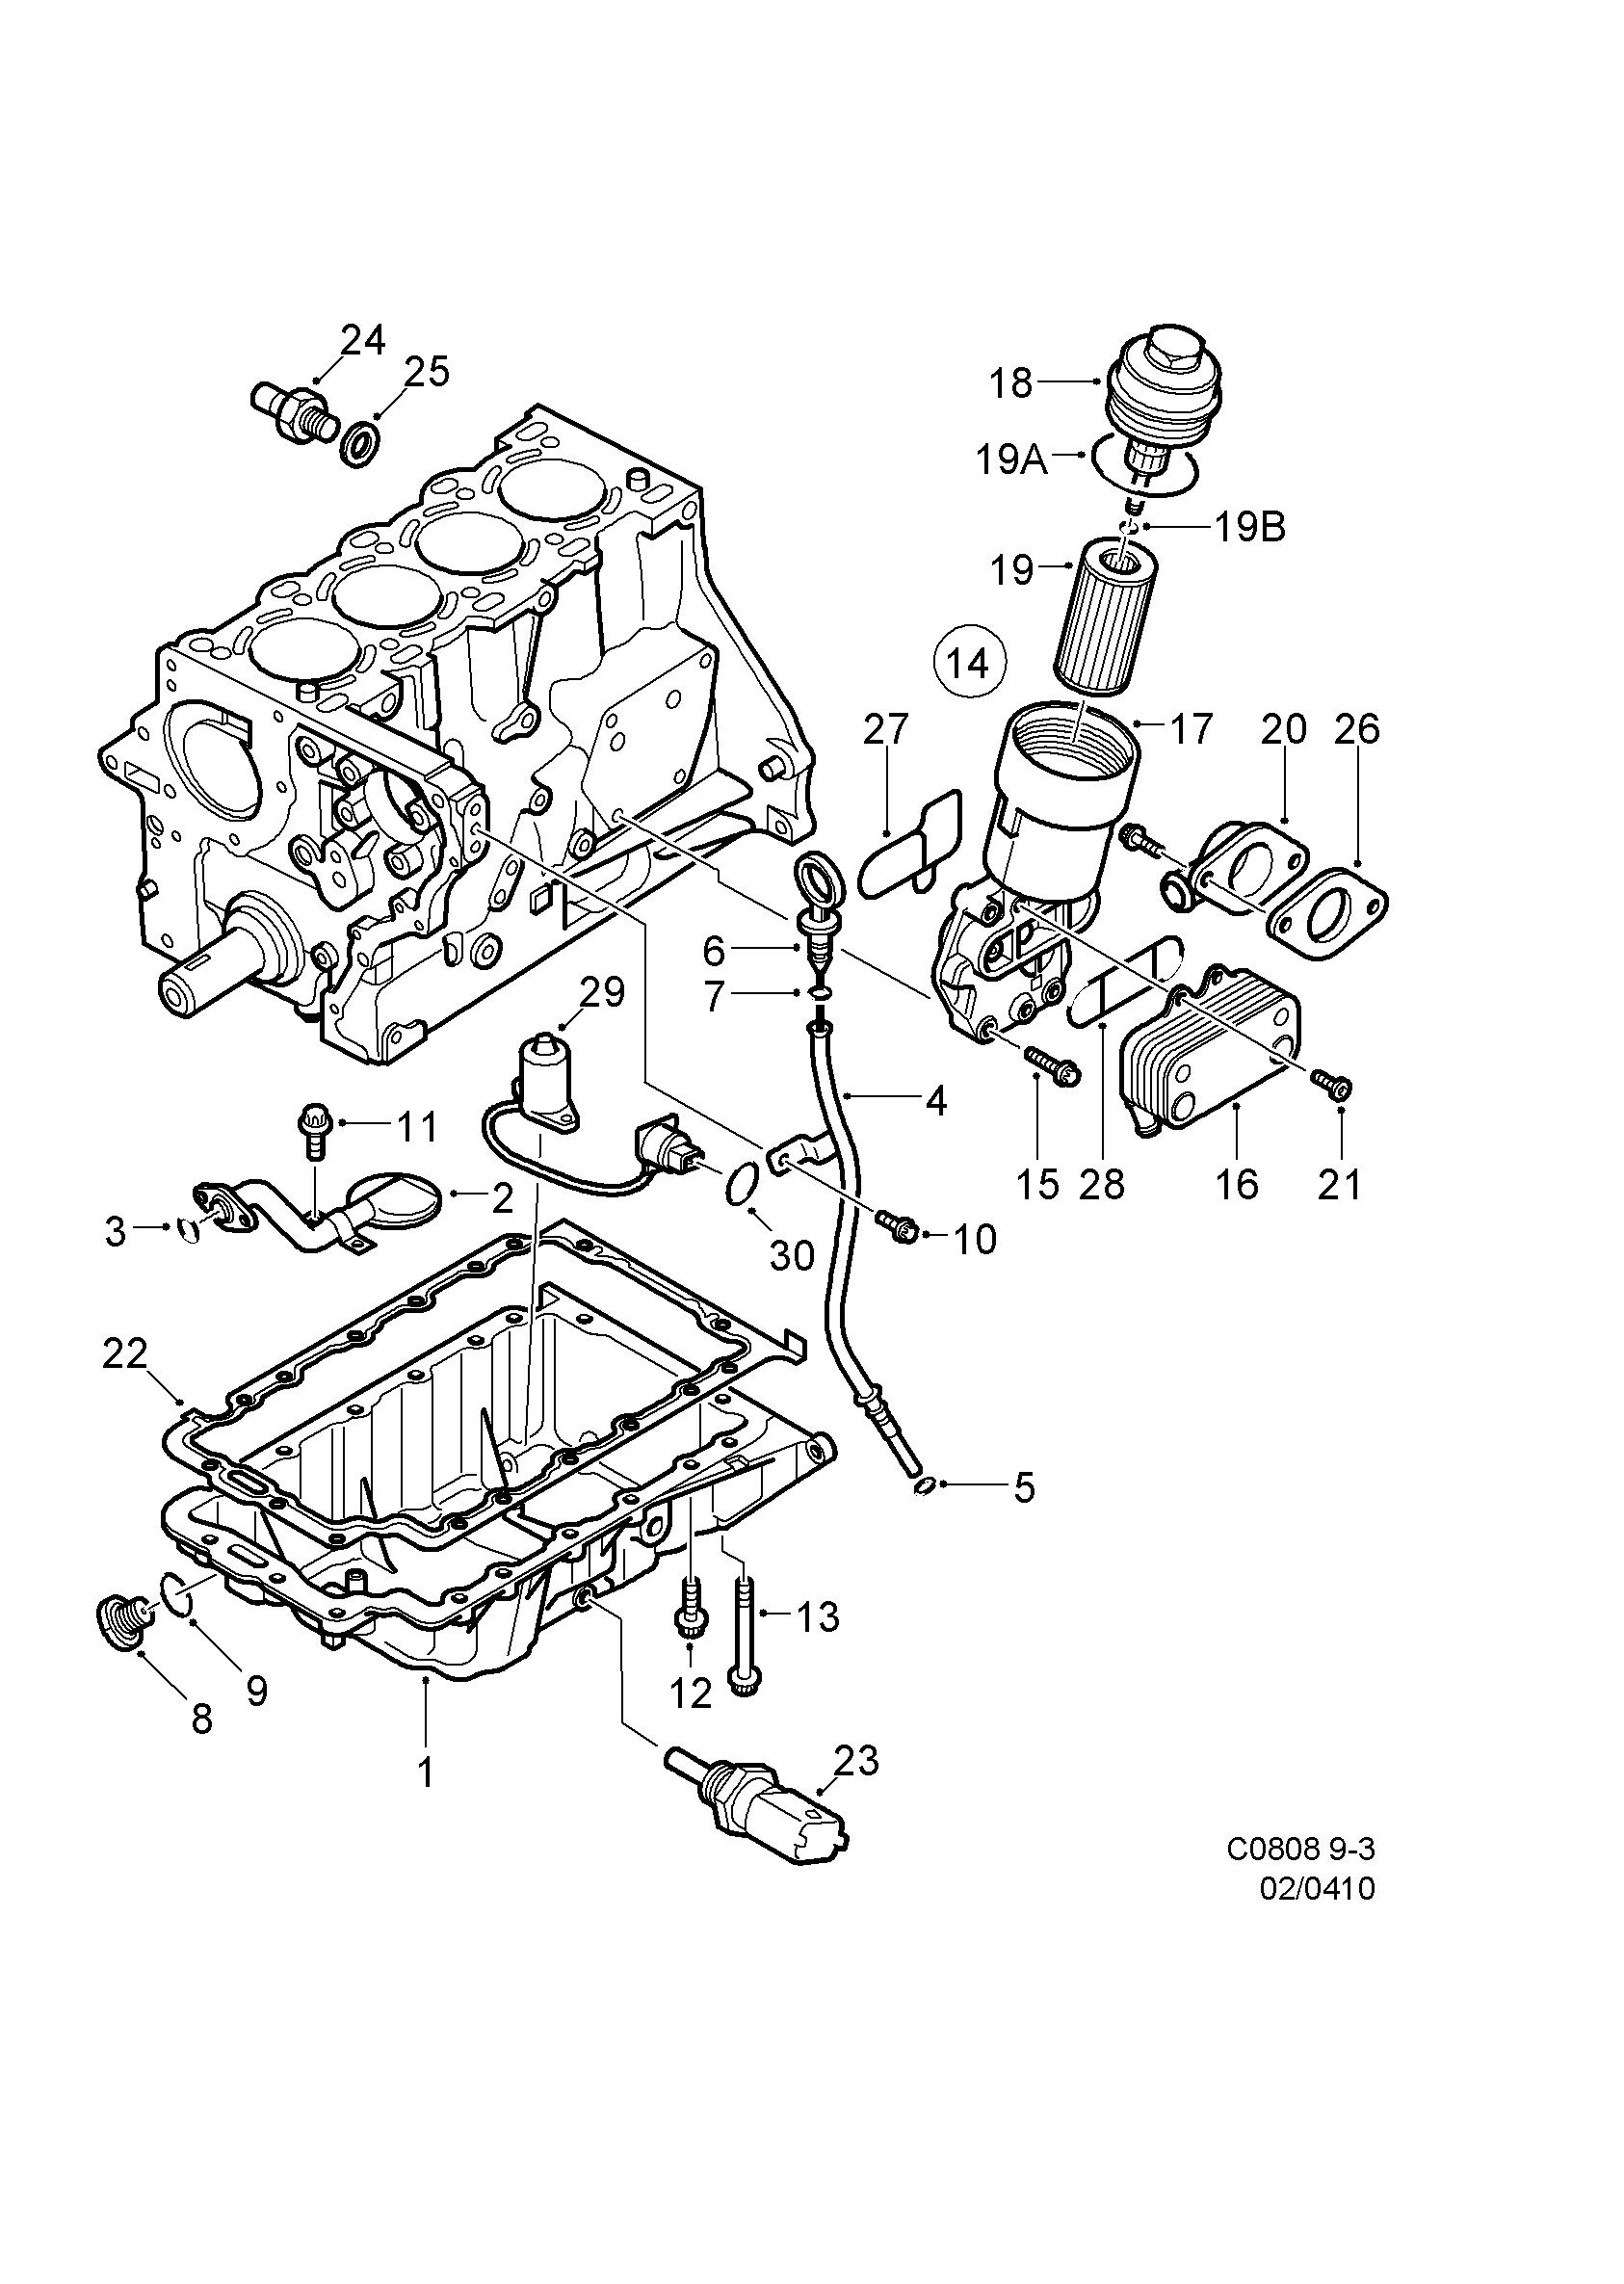 2005 Peterbilt 379 Headlight Wiring Source Fuse Box Pb362 Cab Schematic Sk14799